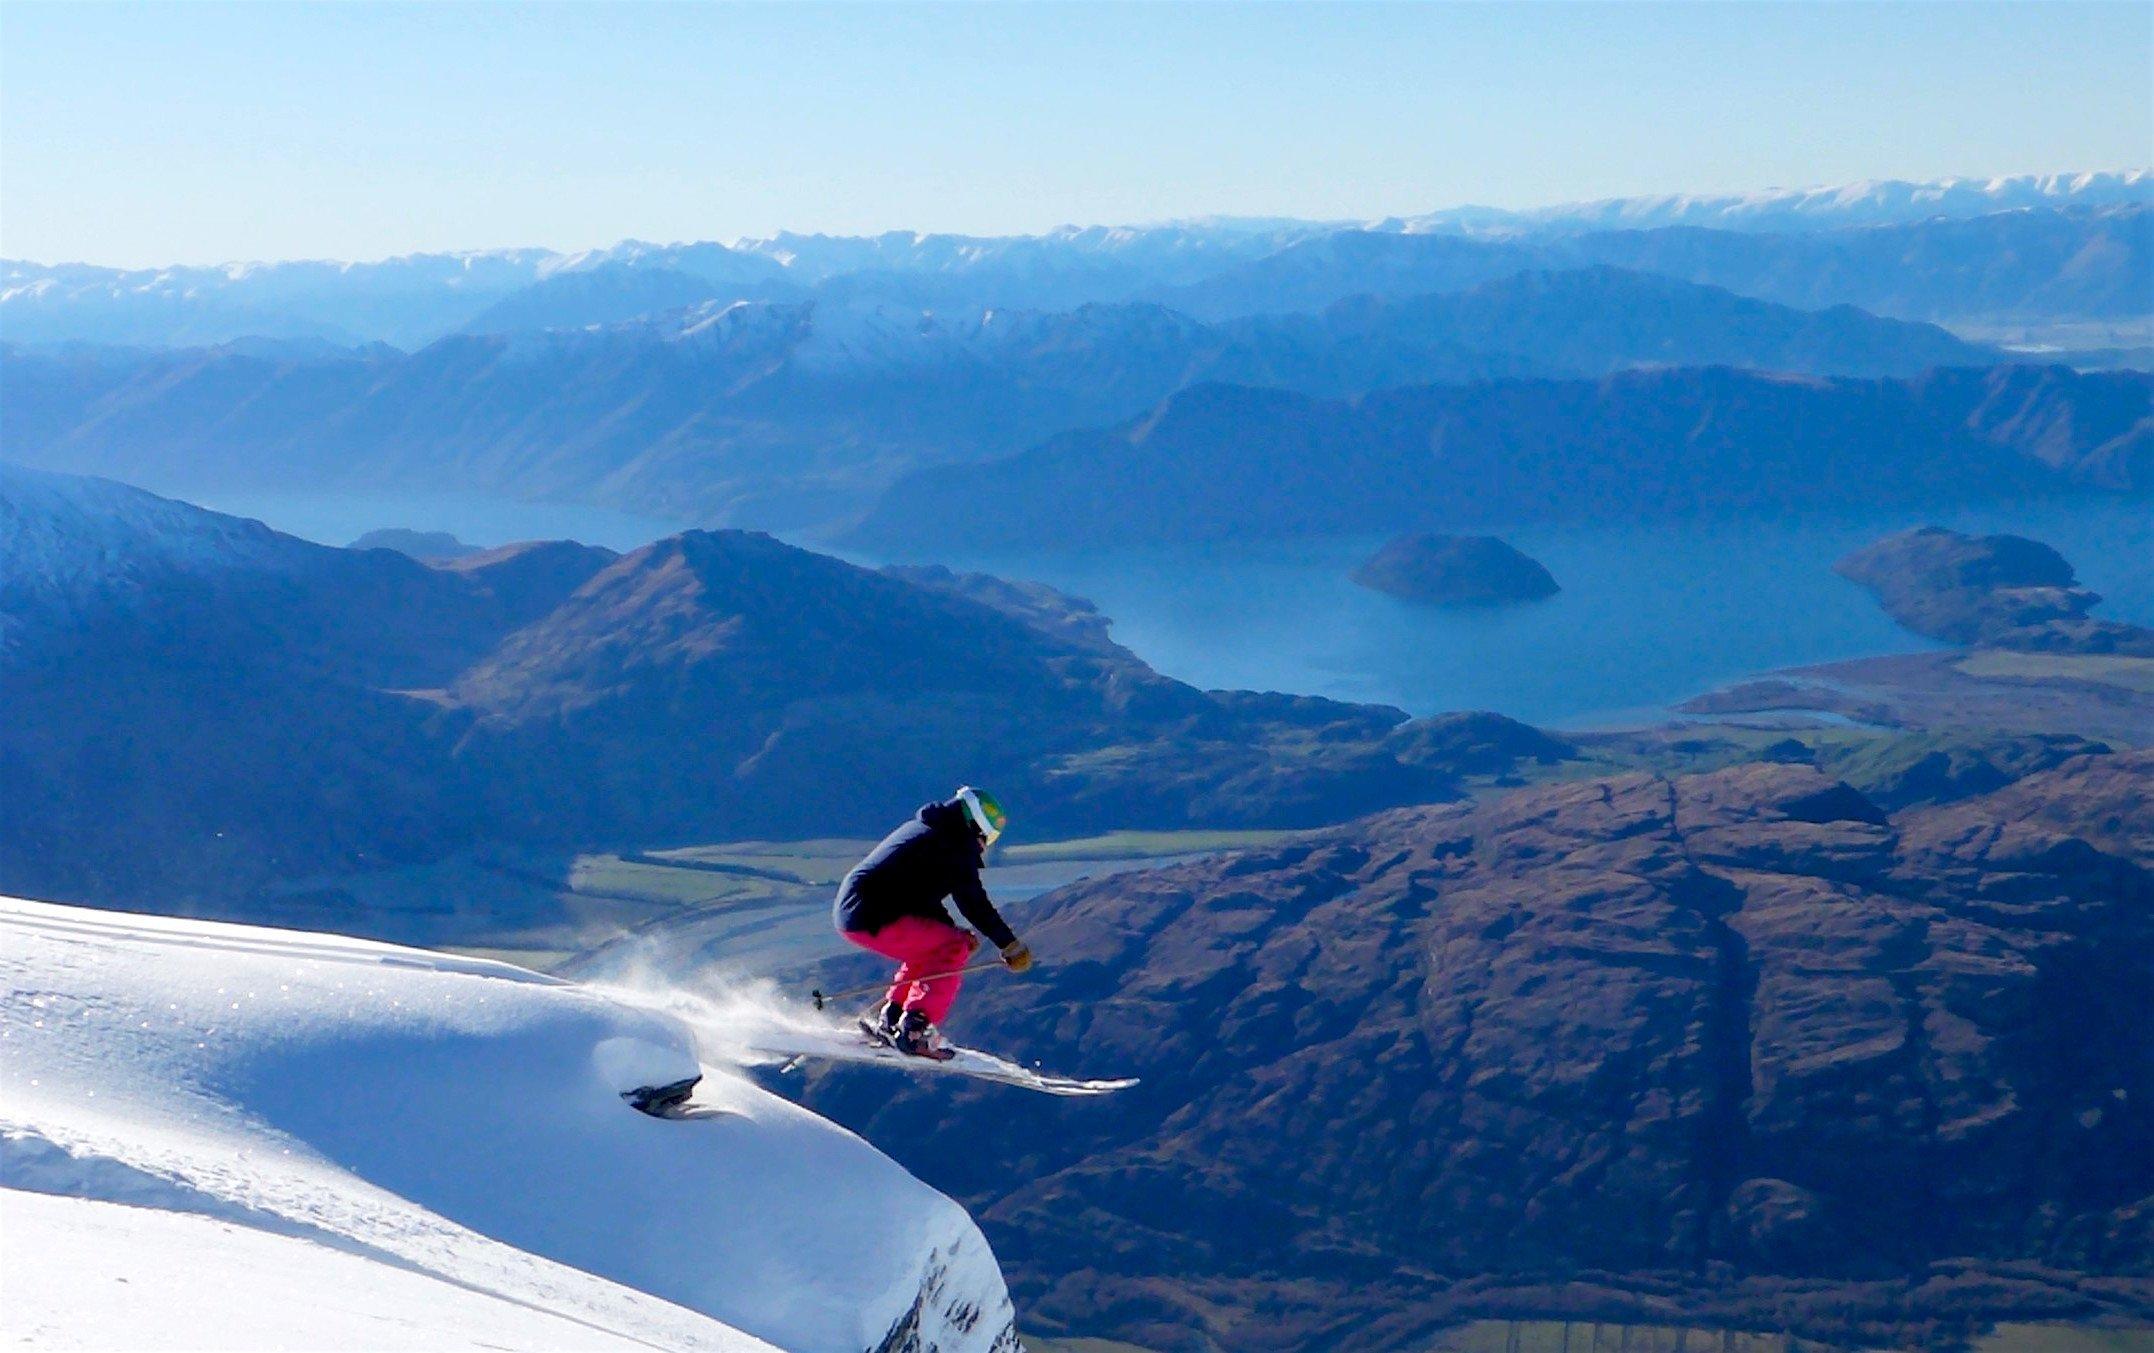 Luxury ski holiday in New Zealand